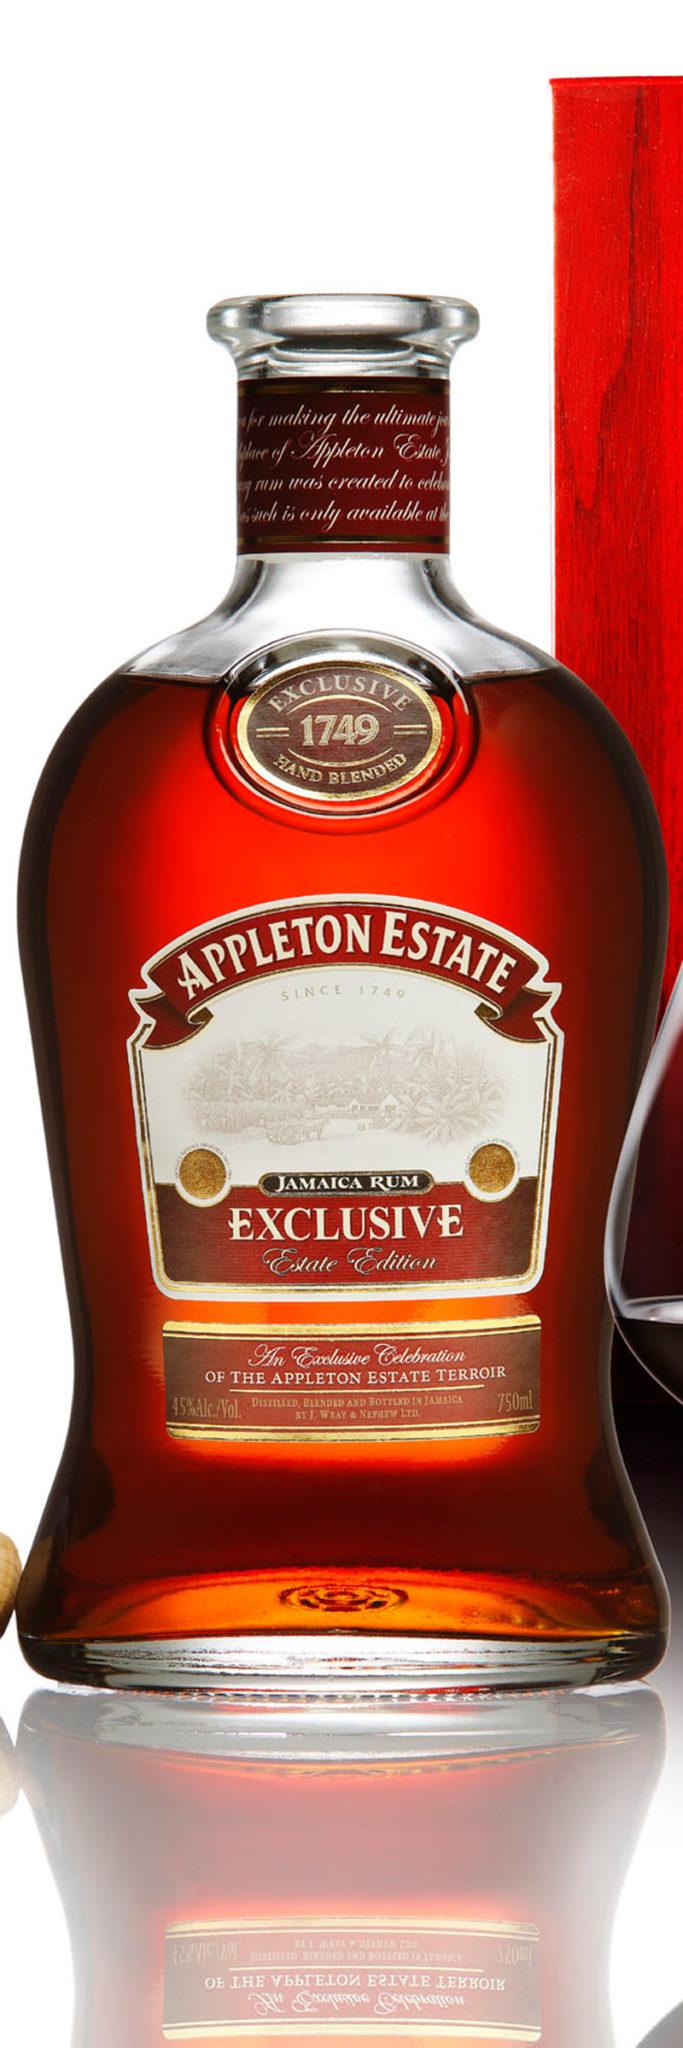 Appleton Estate Exclusive Image